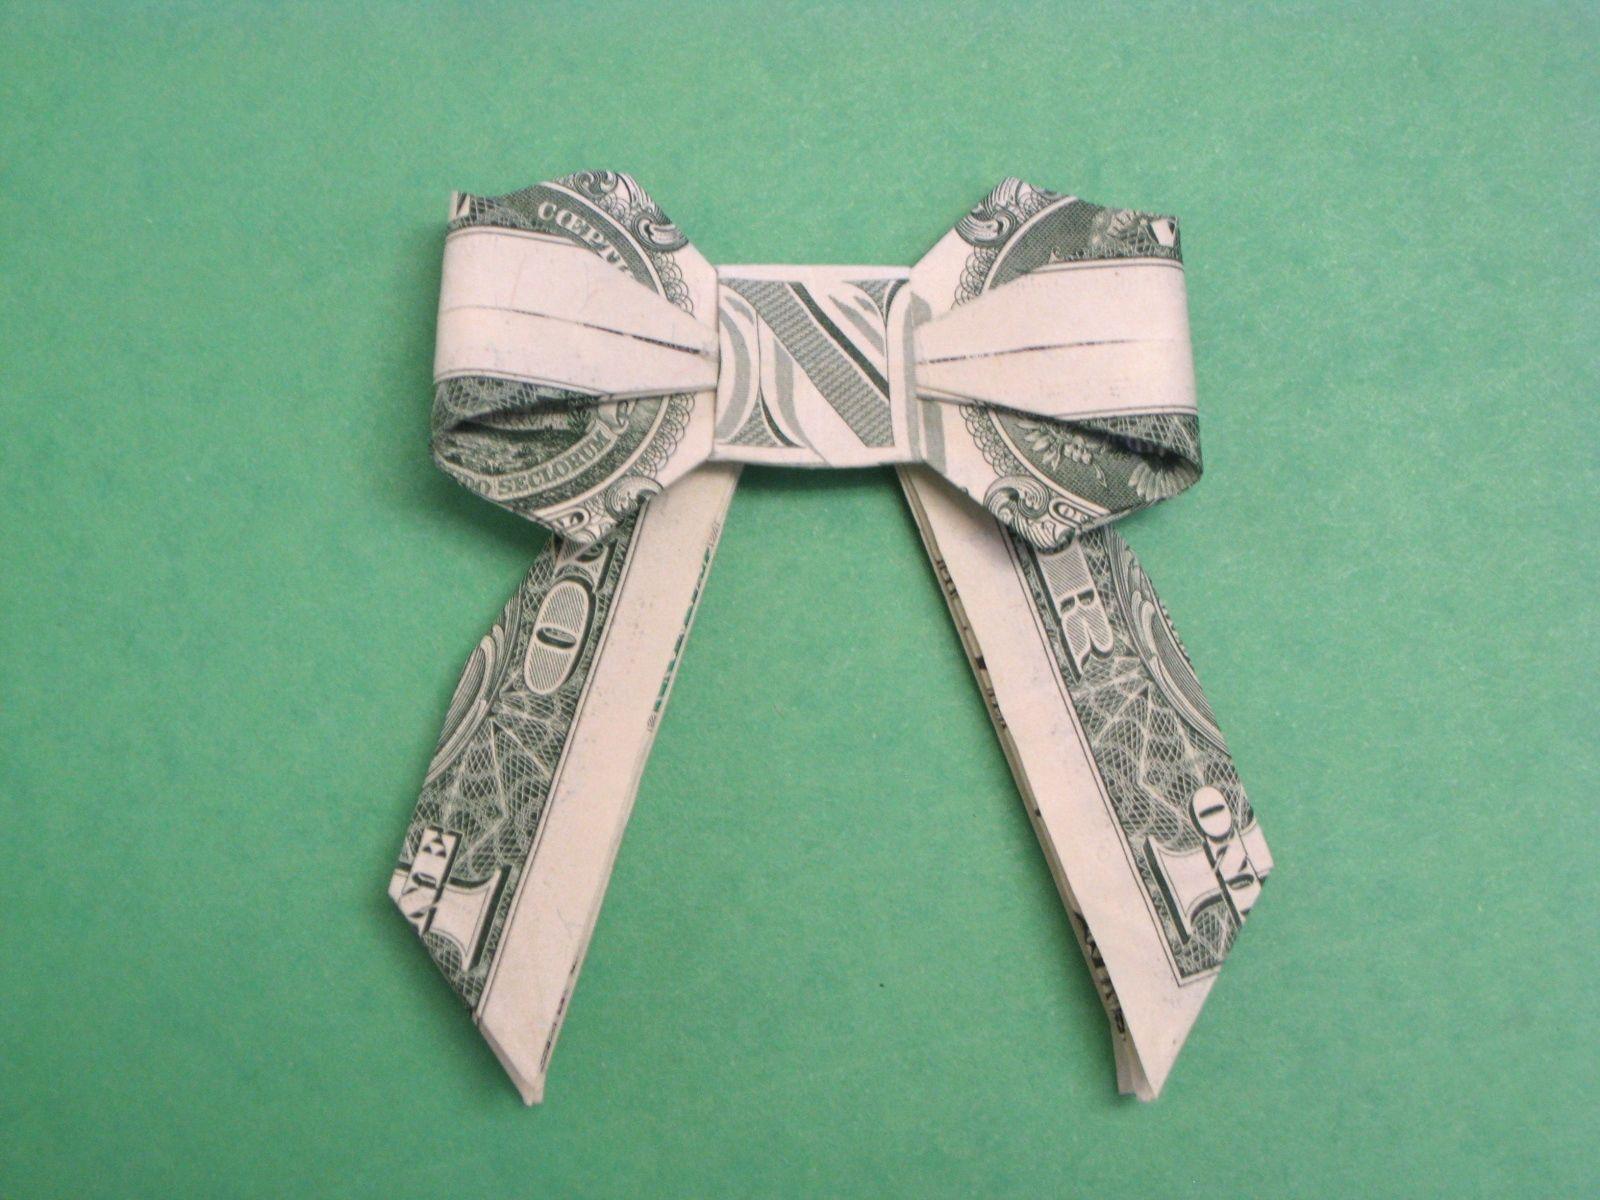 money origami diagram ceiling fan wiring one switch blackmagic things pinterest oragami